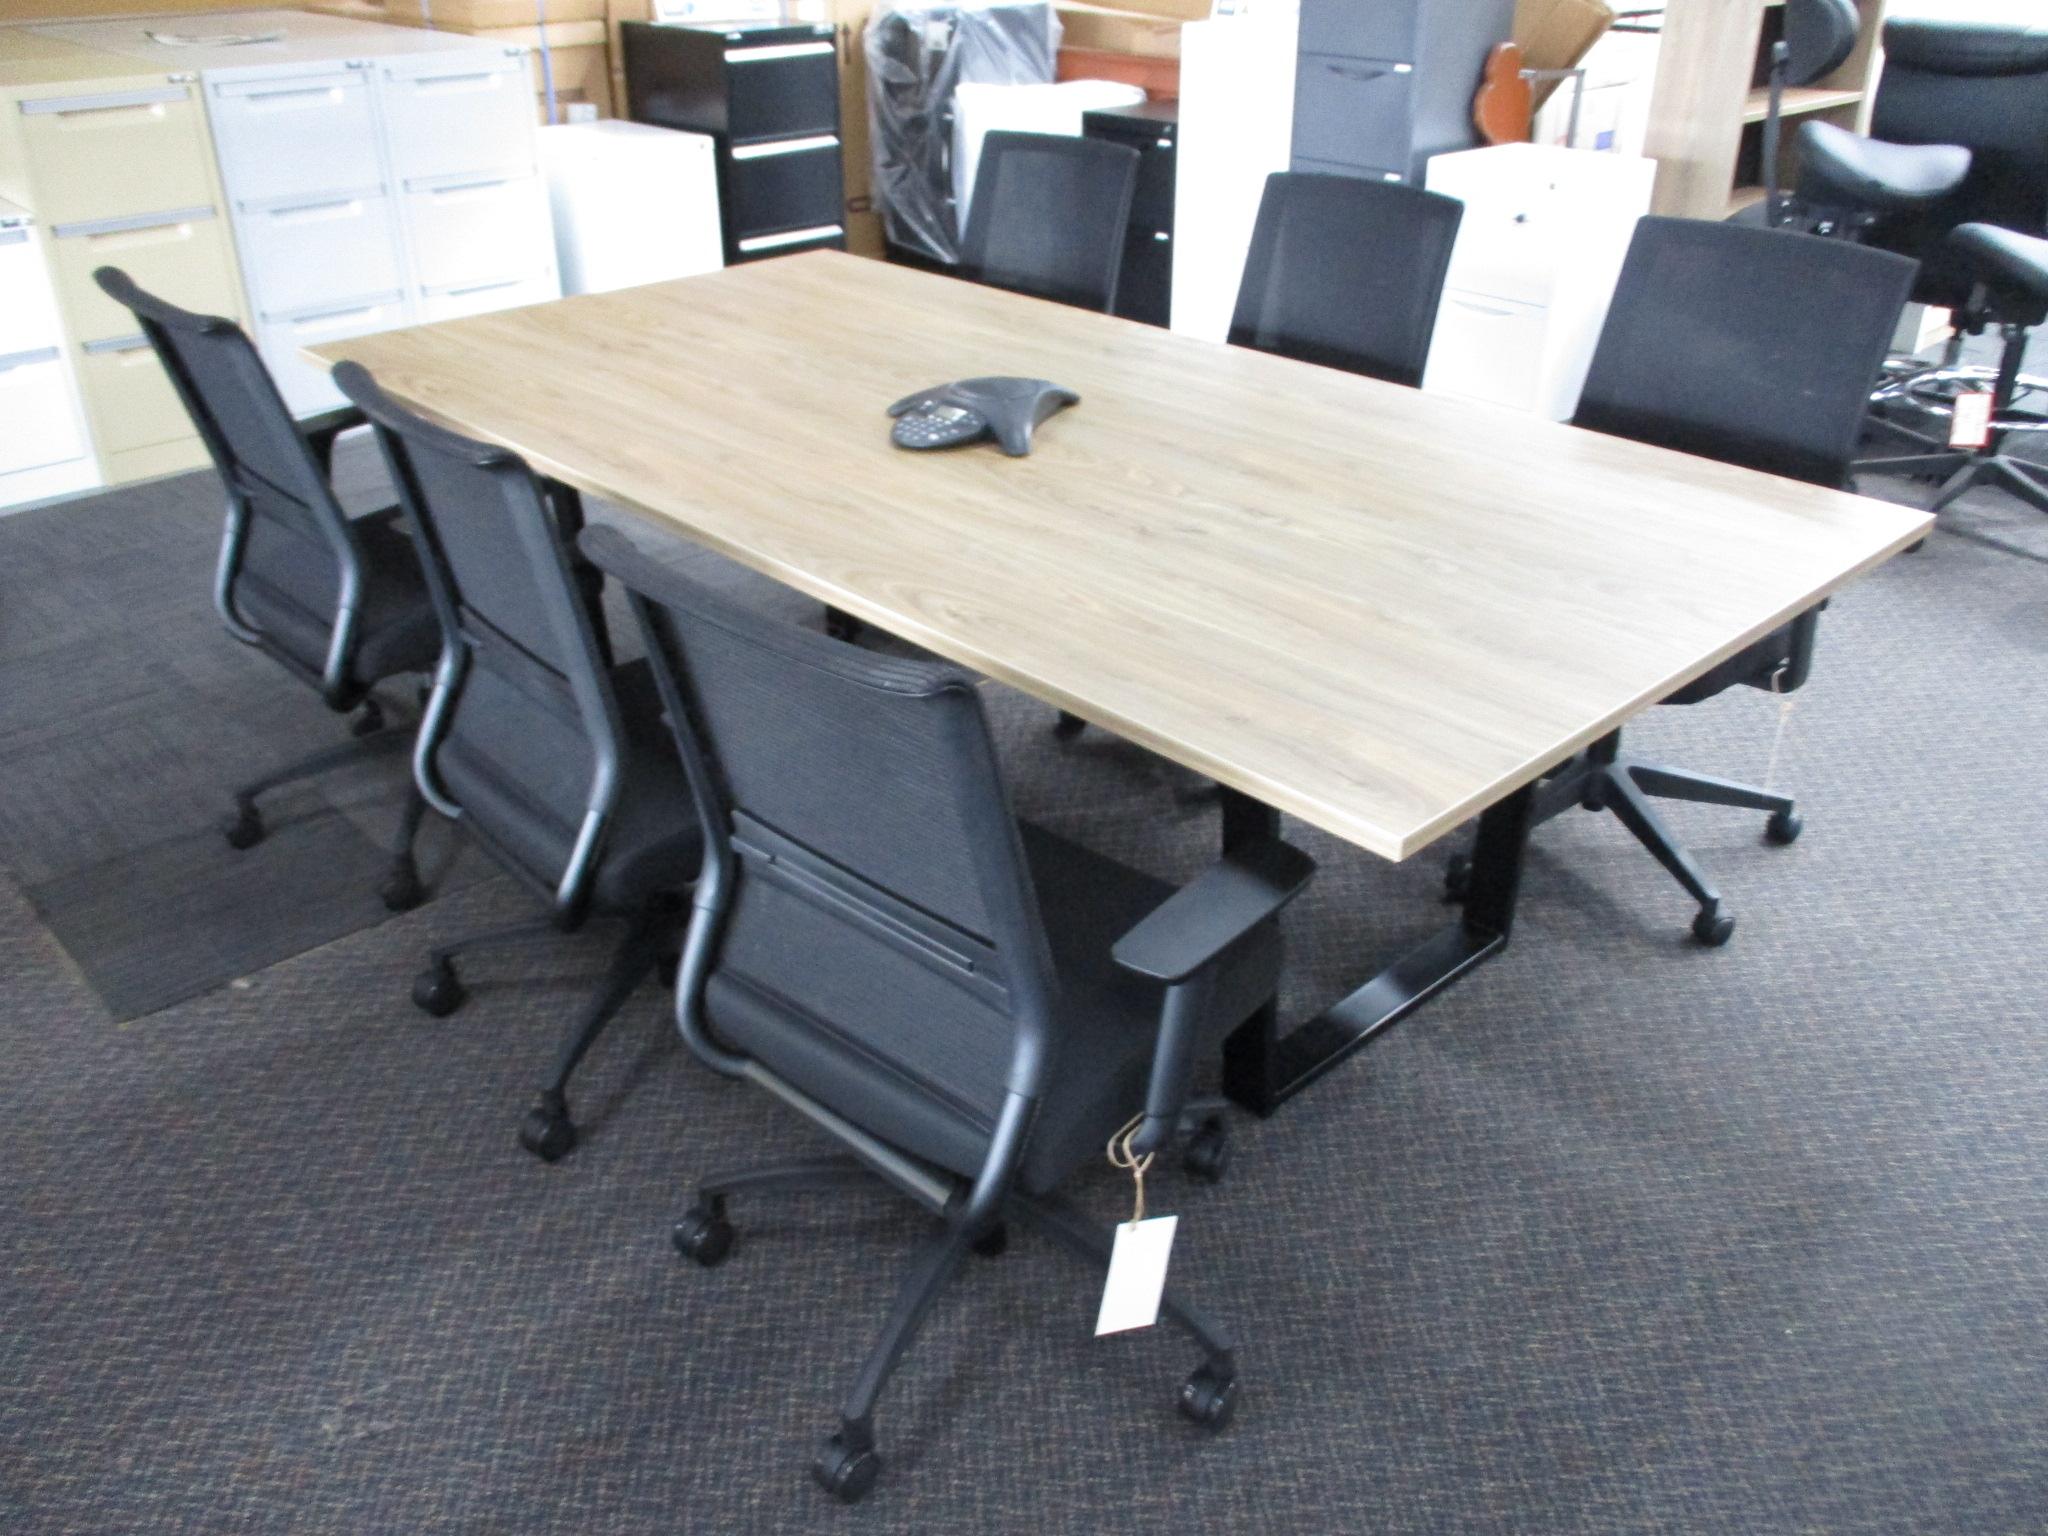 New Natural Walnut Boardroom Table 2400×1200 $750